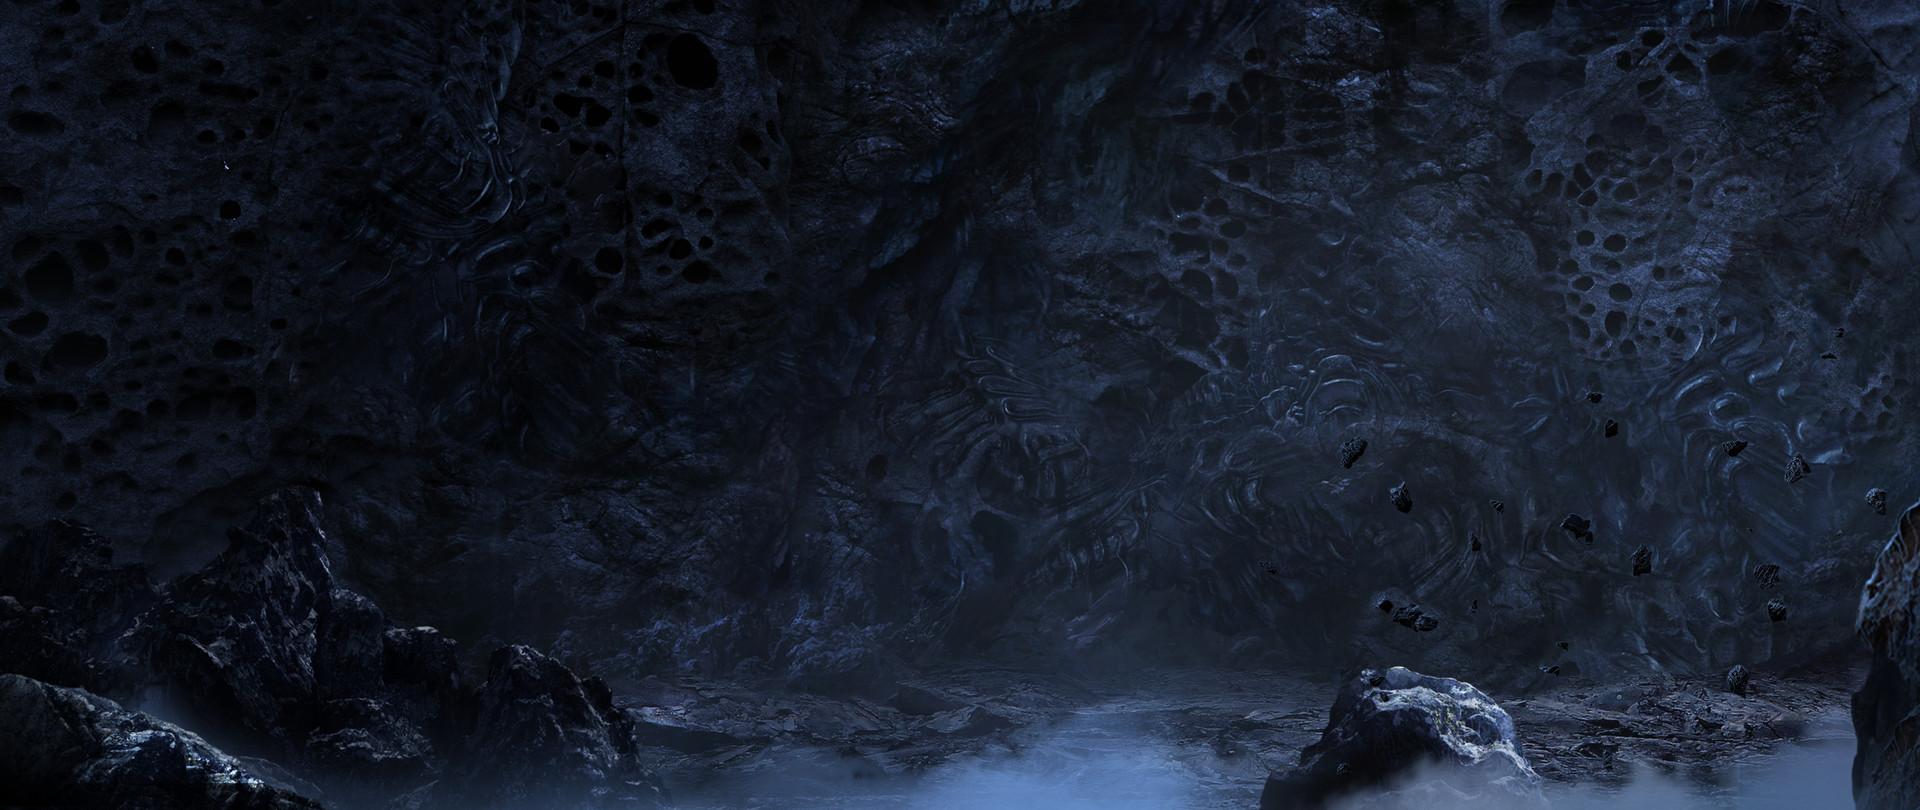 Alien Background texture